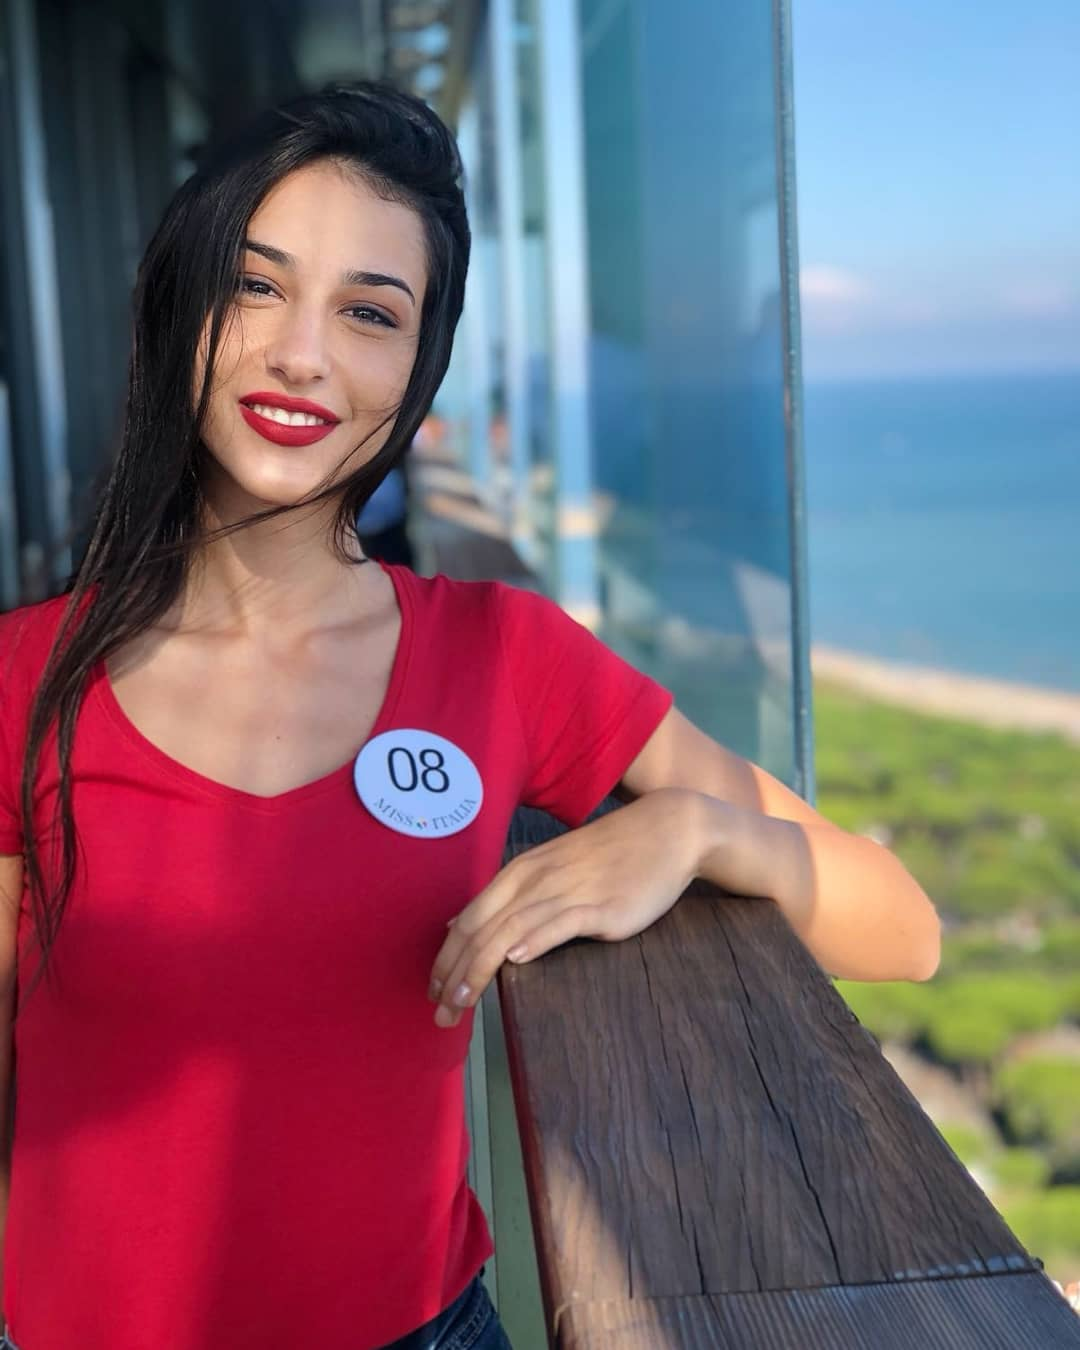 Miss Italia, la napoletana arrivata seconda: